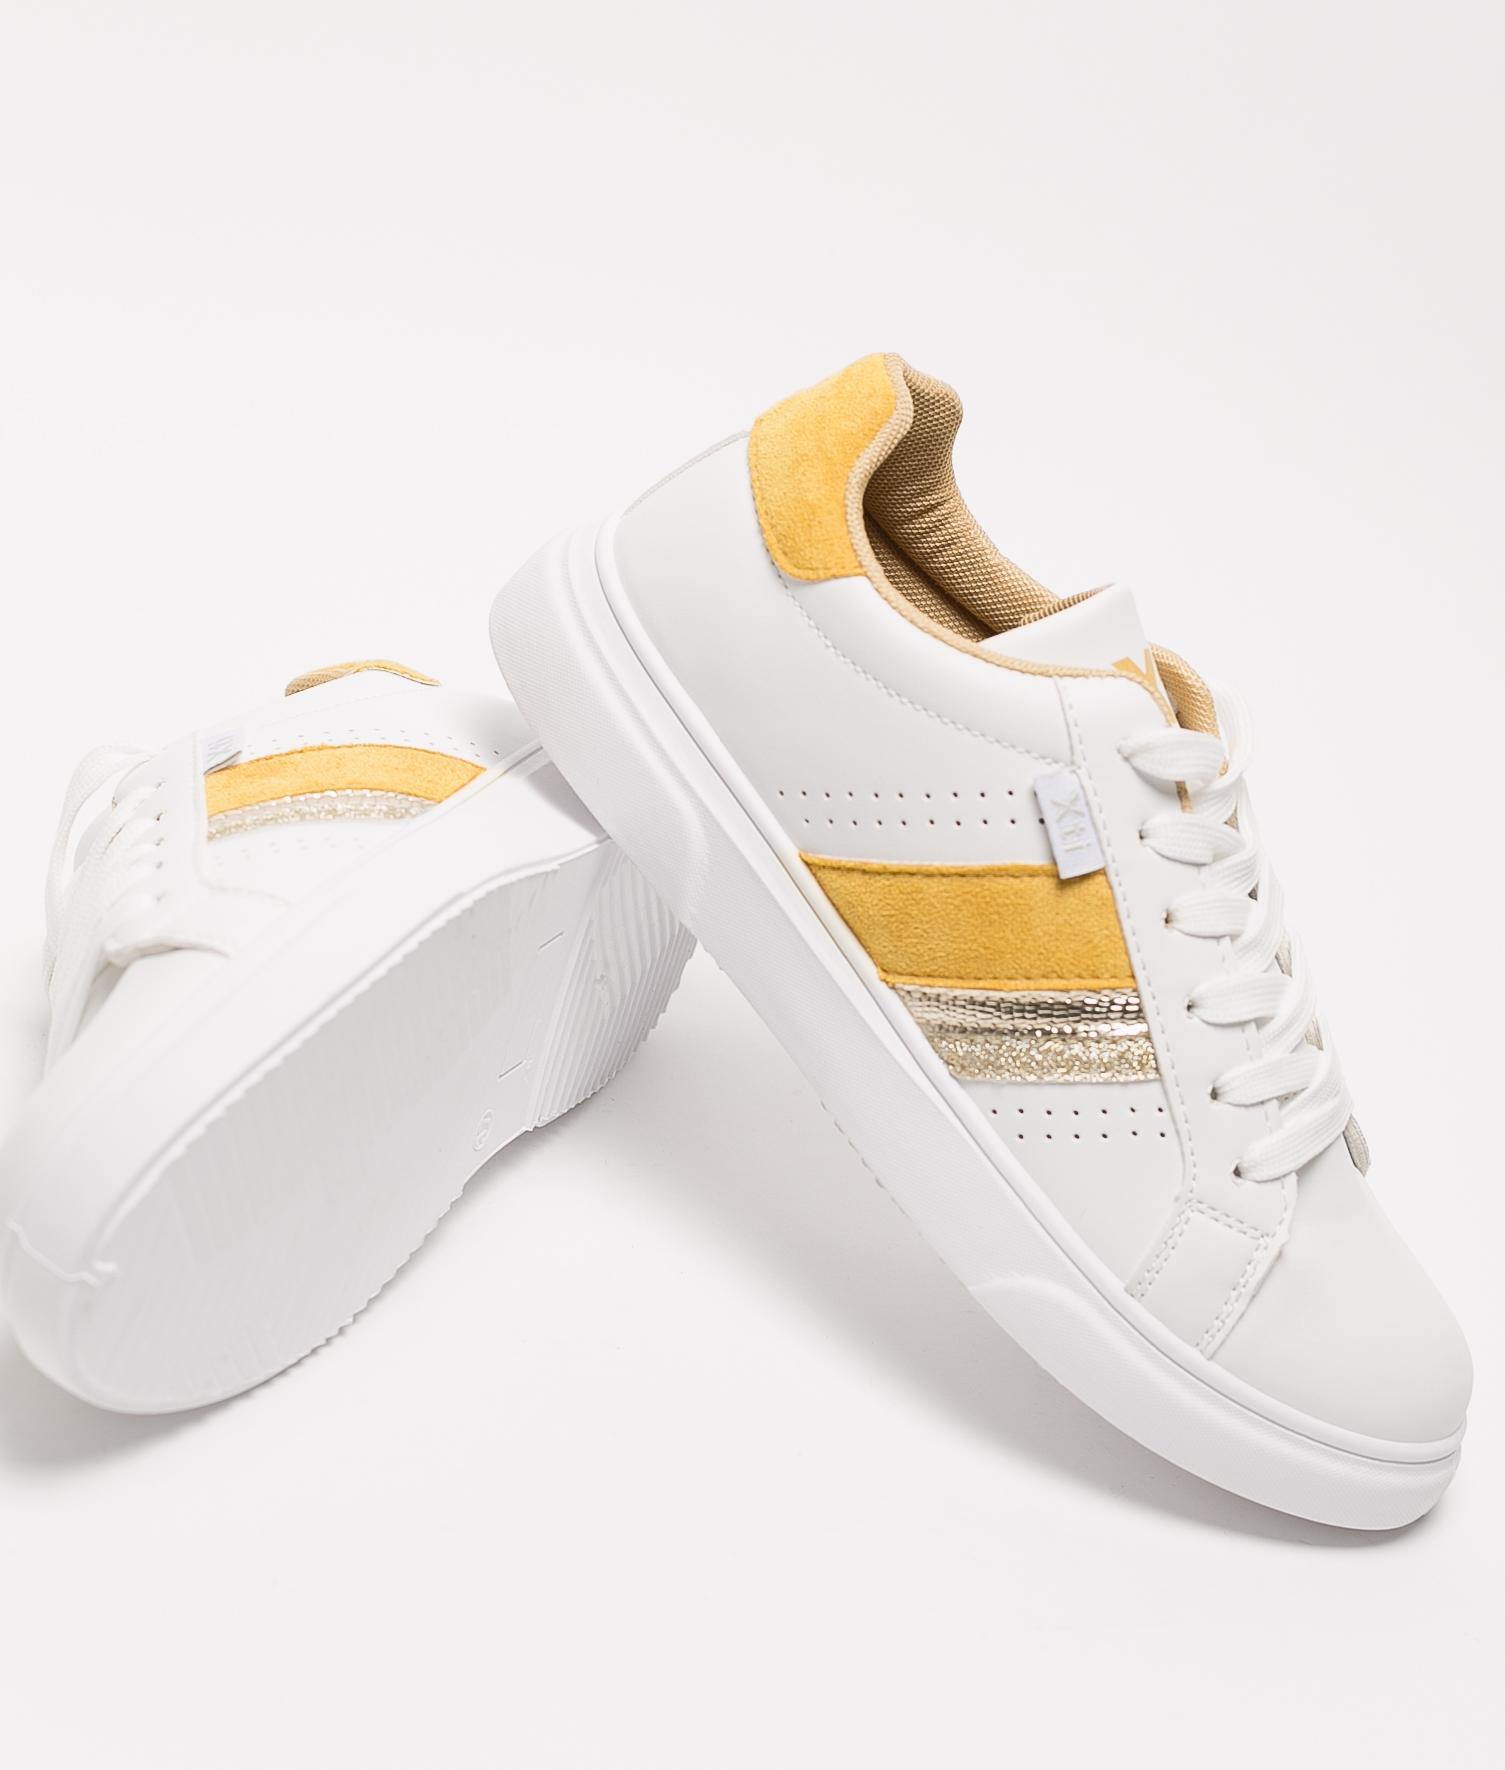 Sneakers Neus Xti - Amarelo